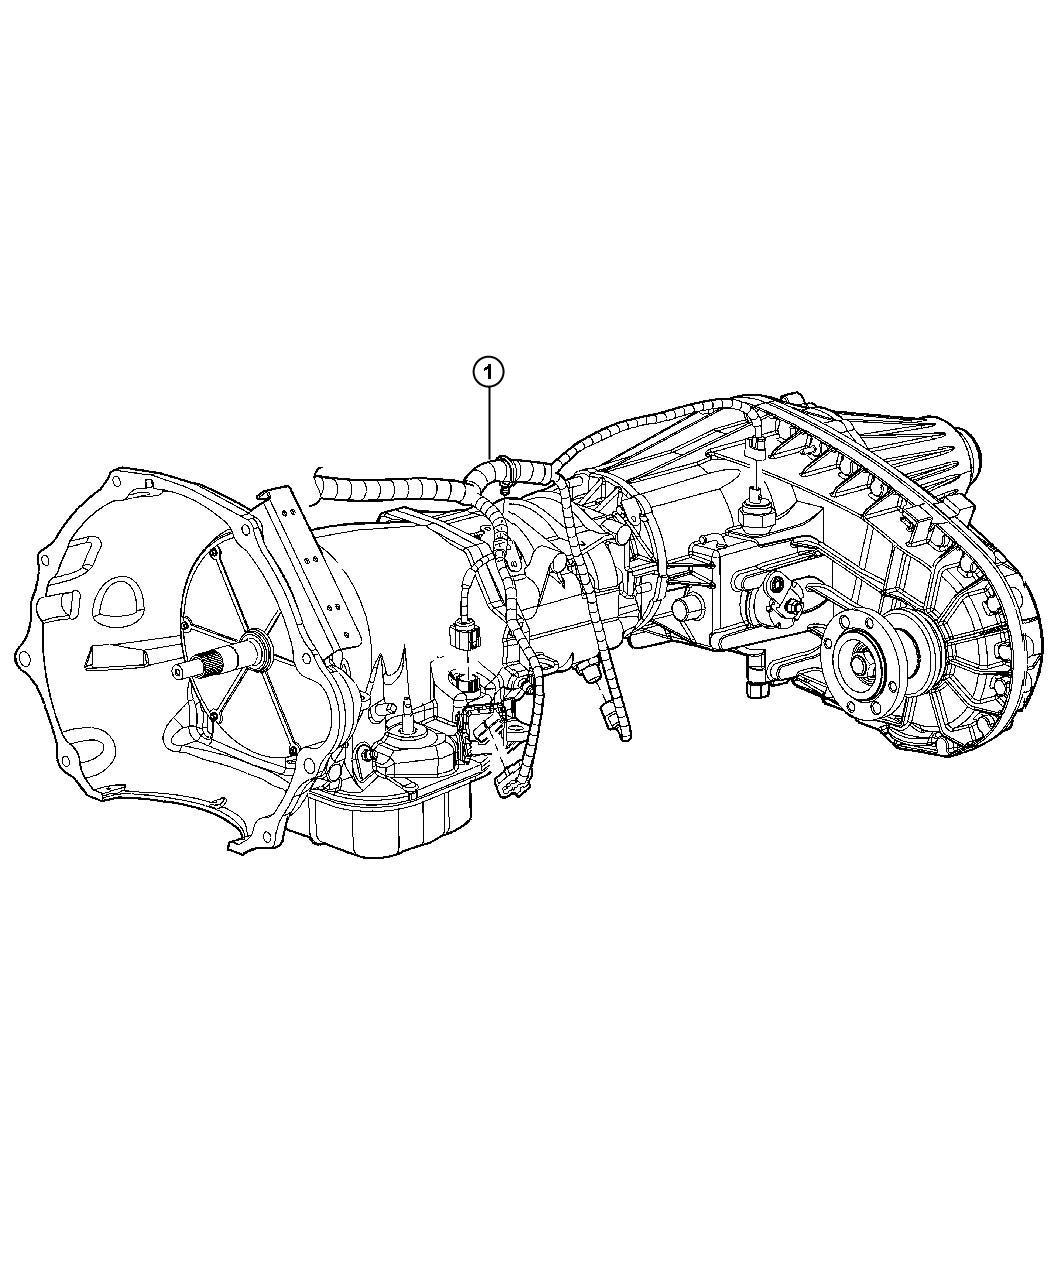 2011 Dodge Ram 2500 Wiring. Transmission. [50 state